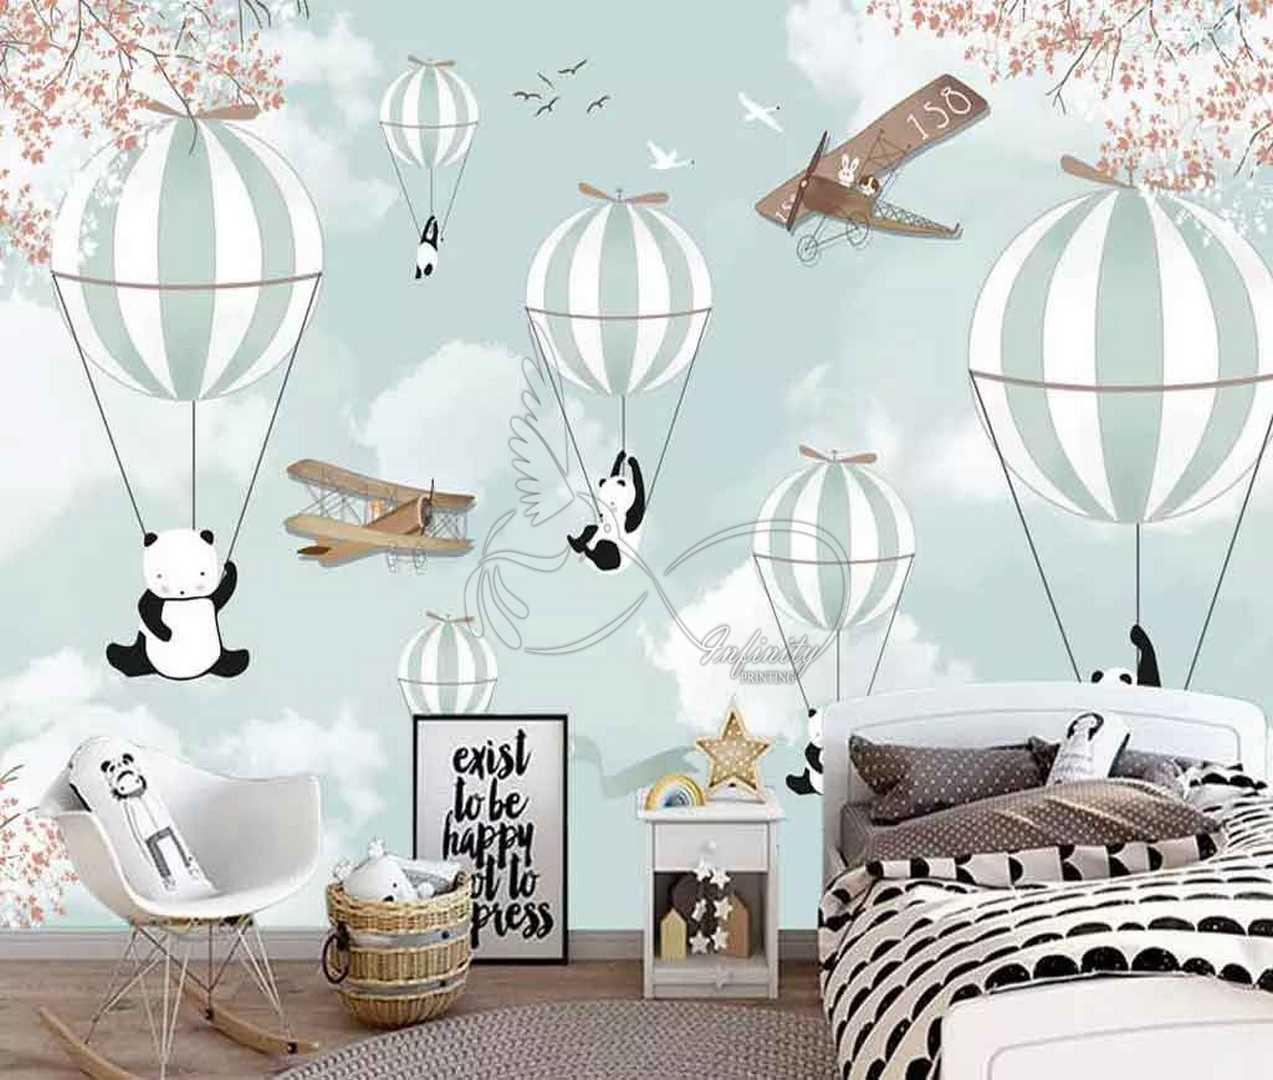 Fantasy child room design wall poster printing code 3123